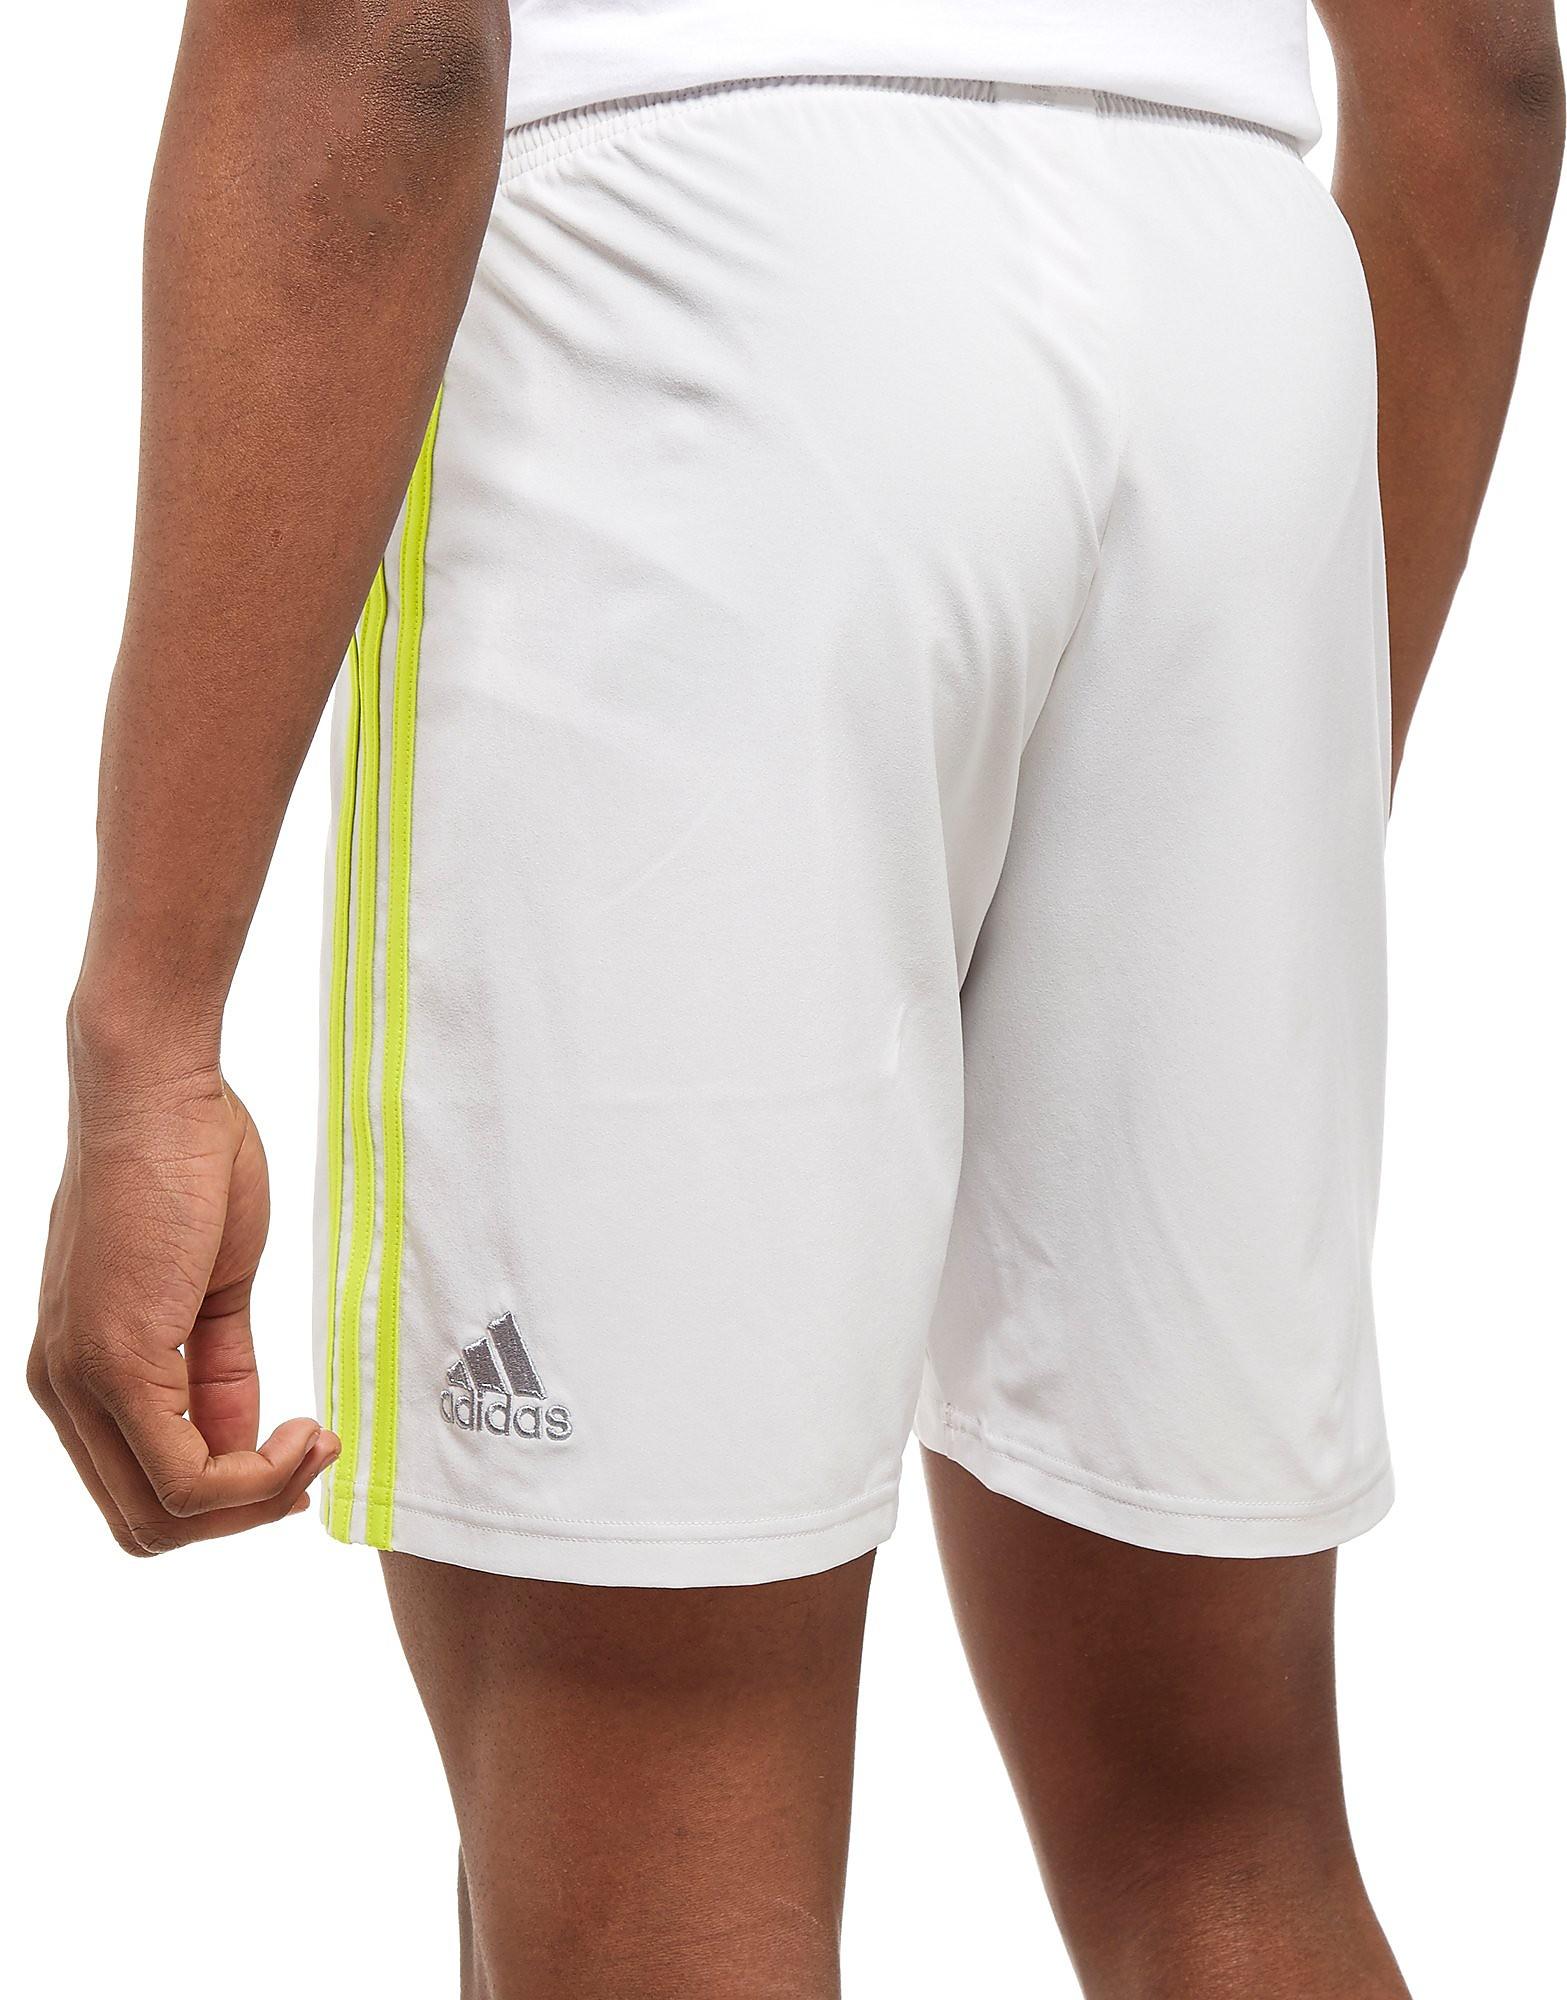 adidas Scotland 2018 Home Goalkeeper Shorts